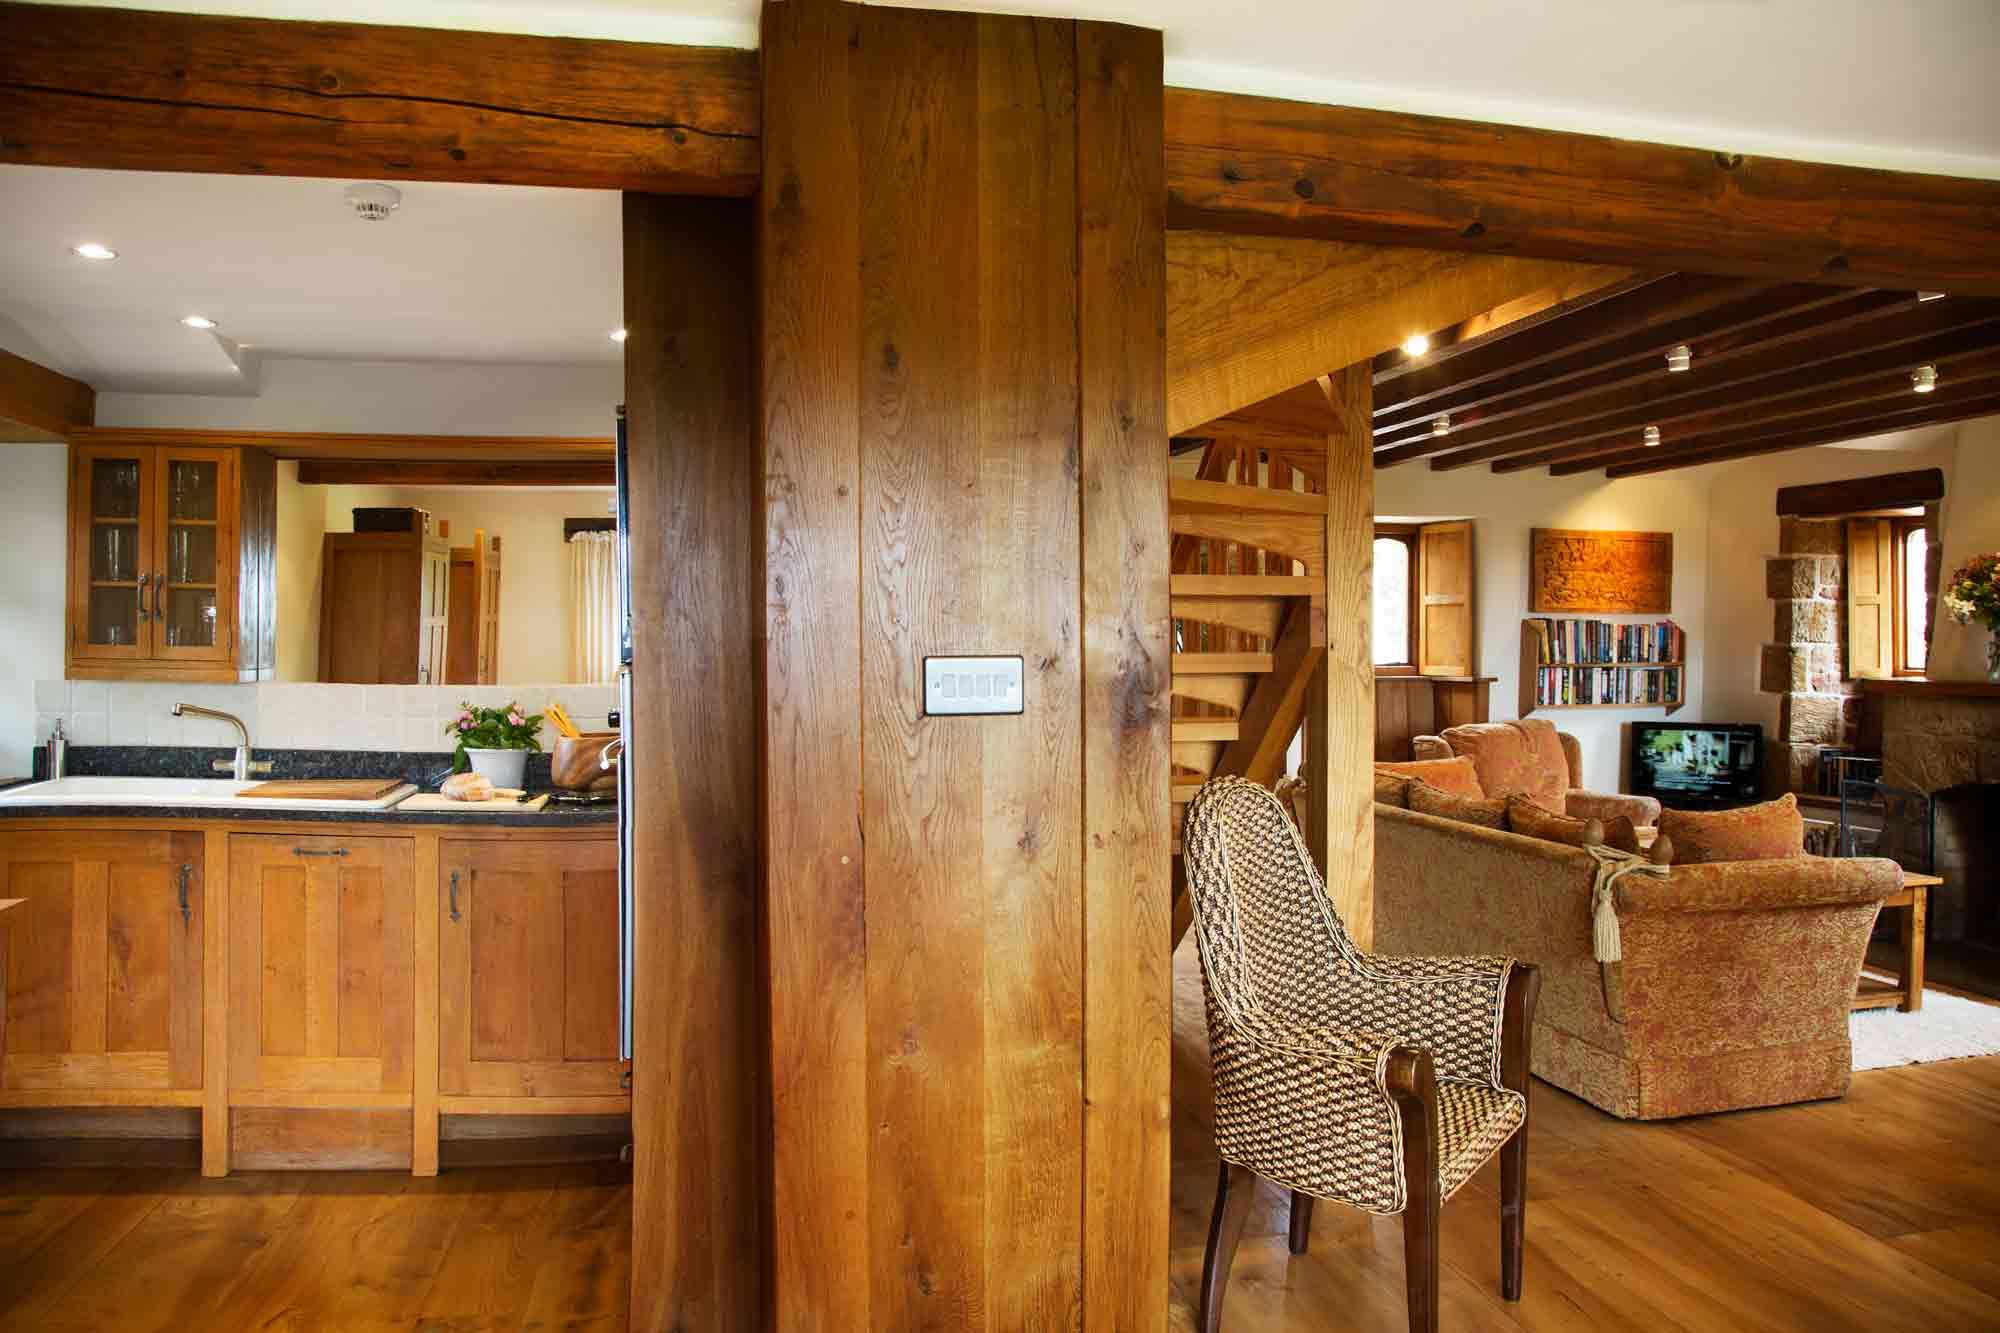 Cobnut - Heath Farm Cottages - Chipping Norton Oxfordshire - Spacious Living Areas